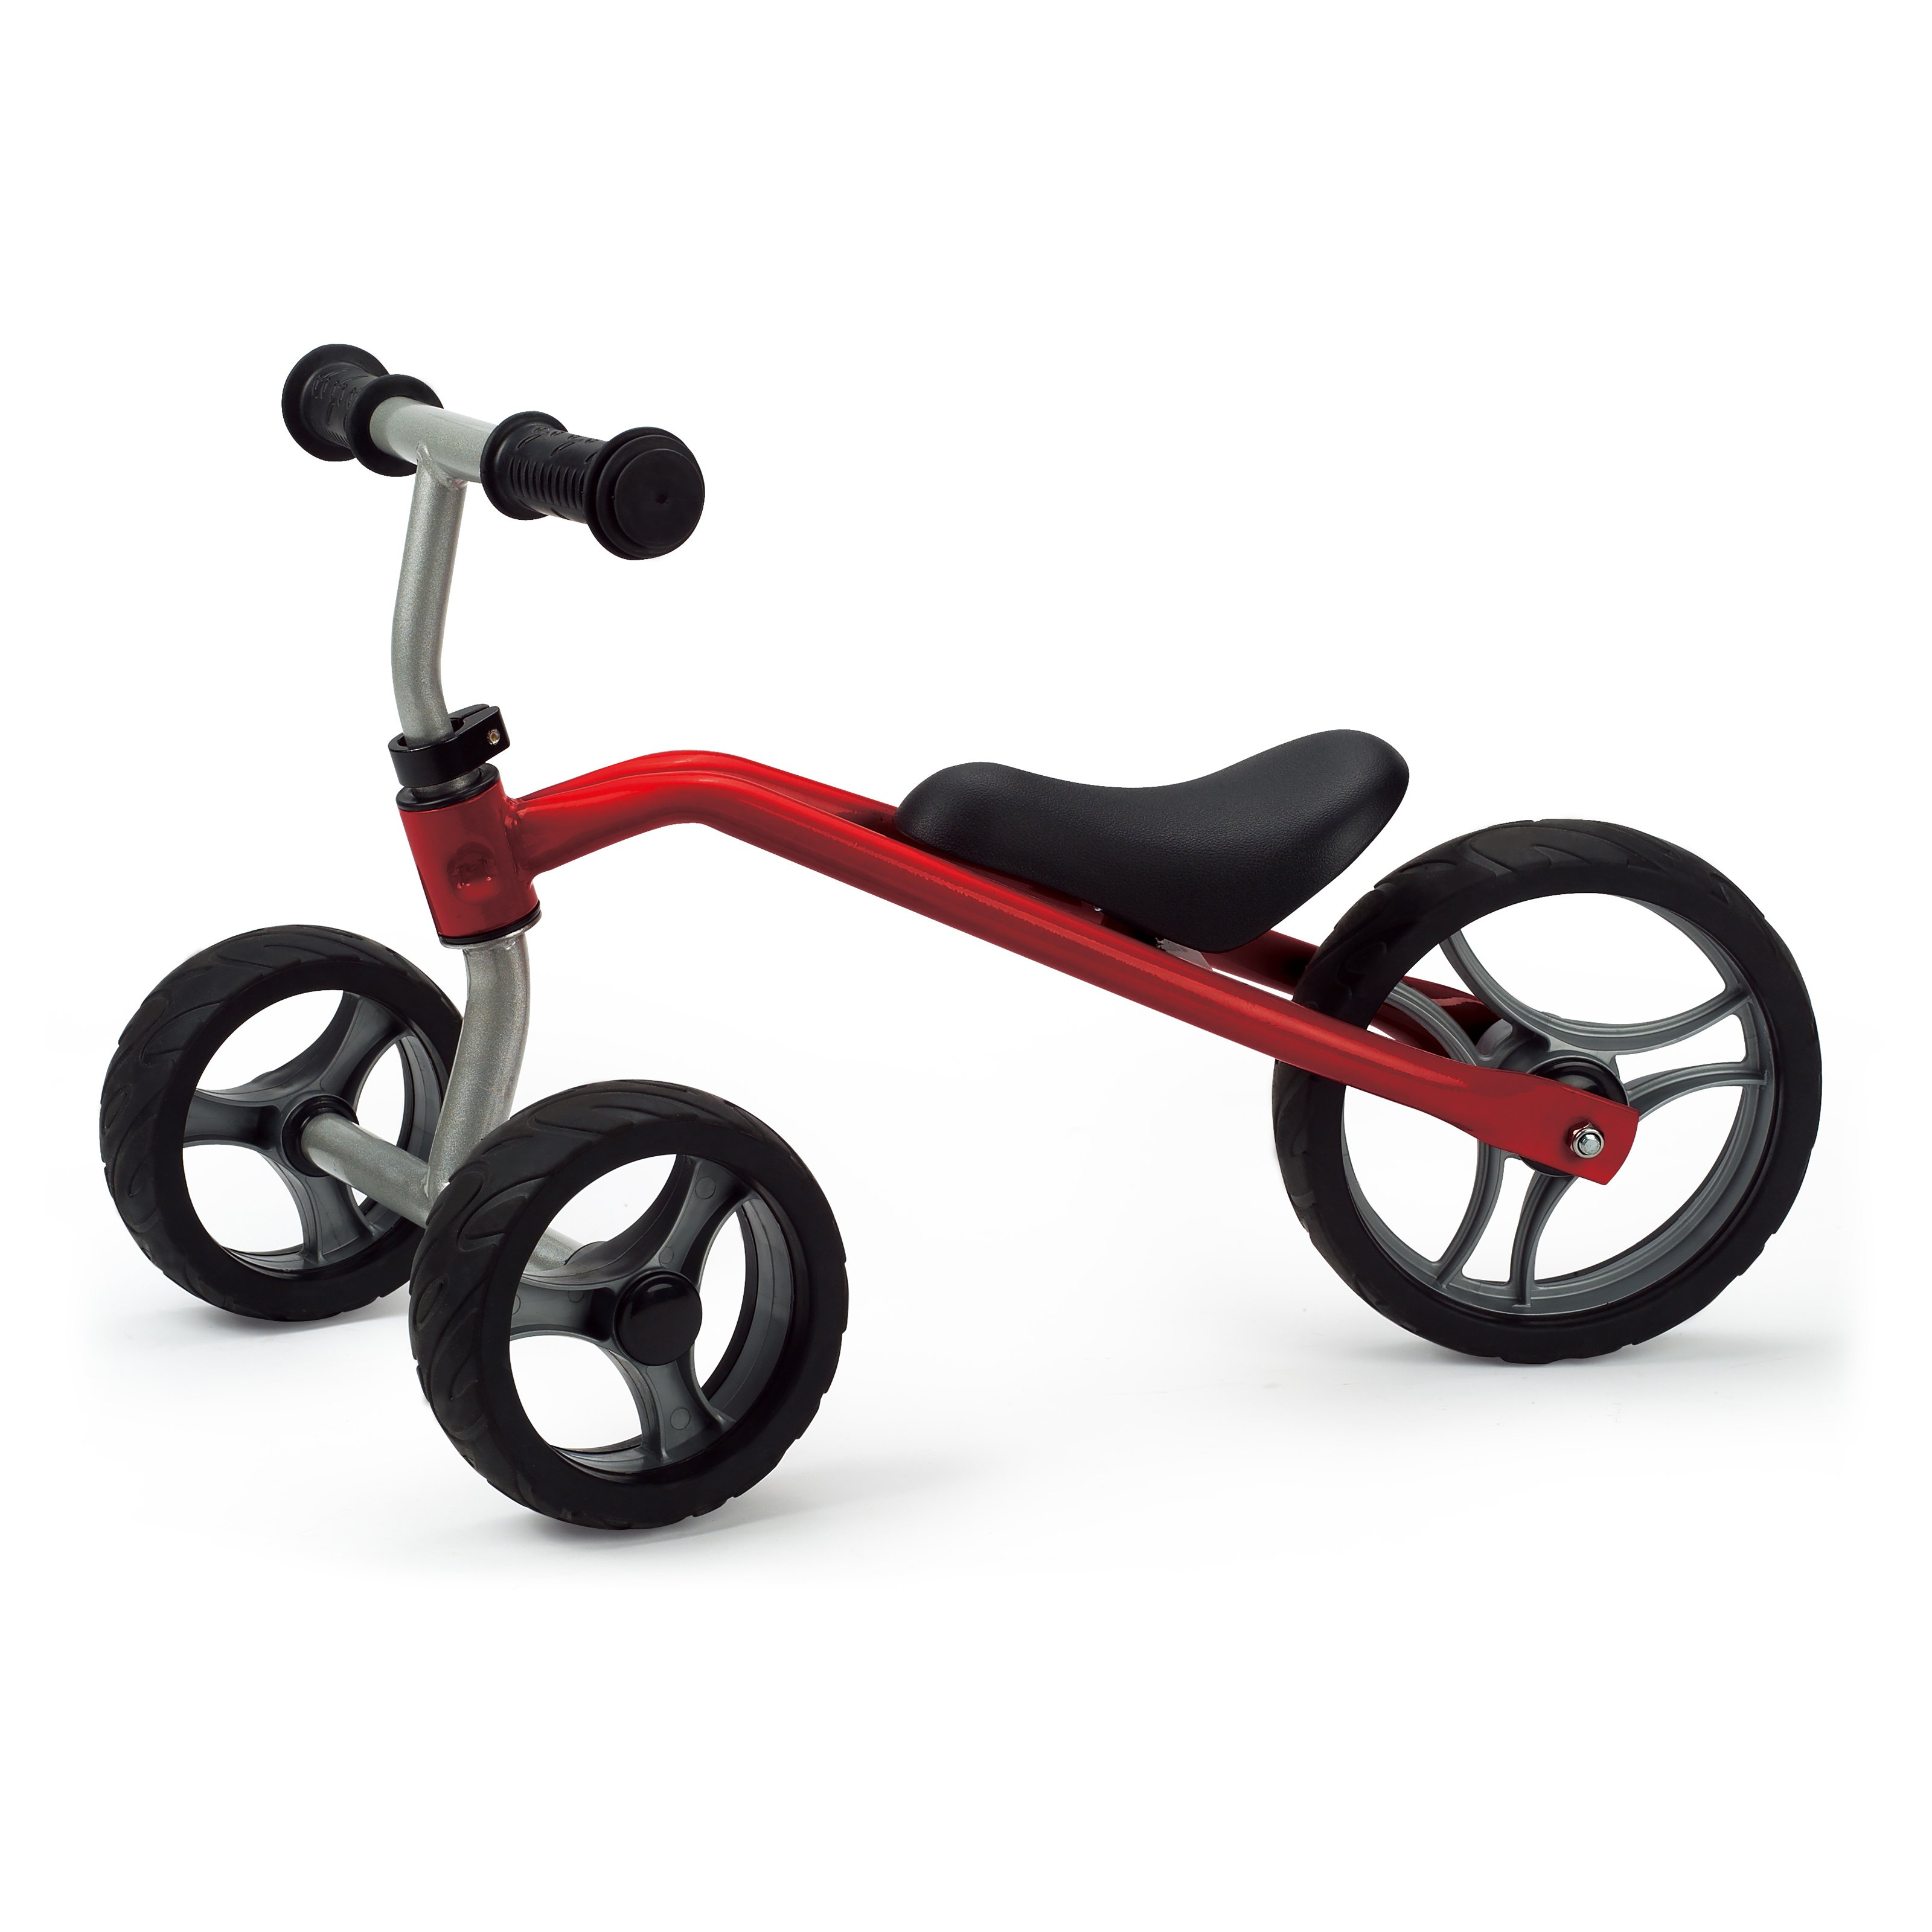 Hape-Tricycle Walker DS by HaPe